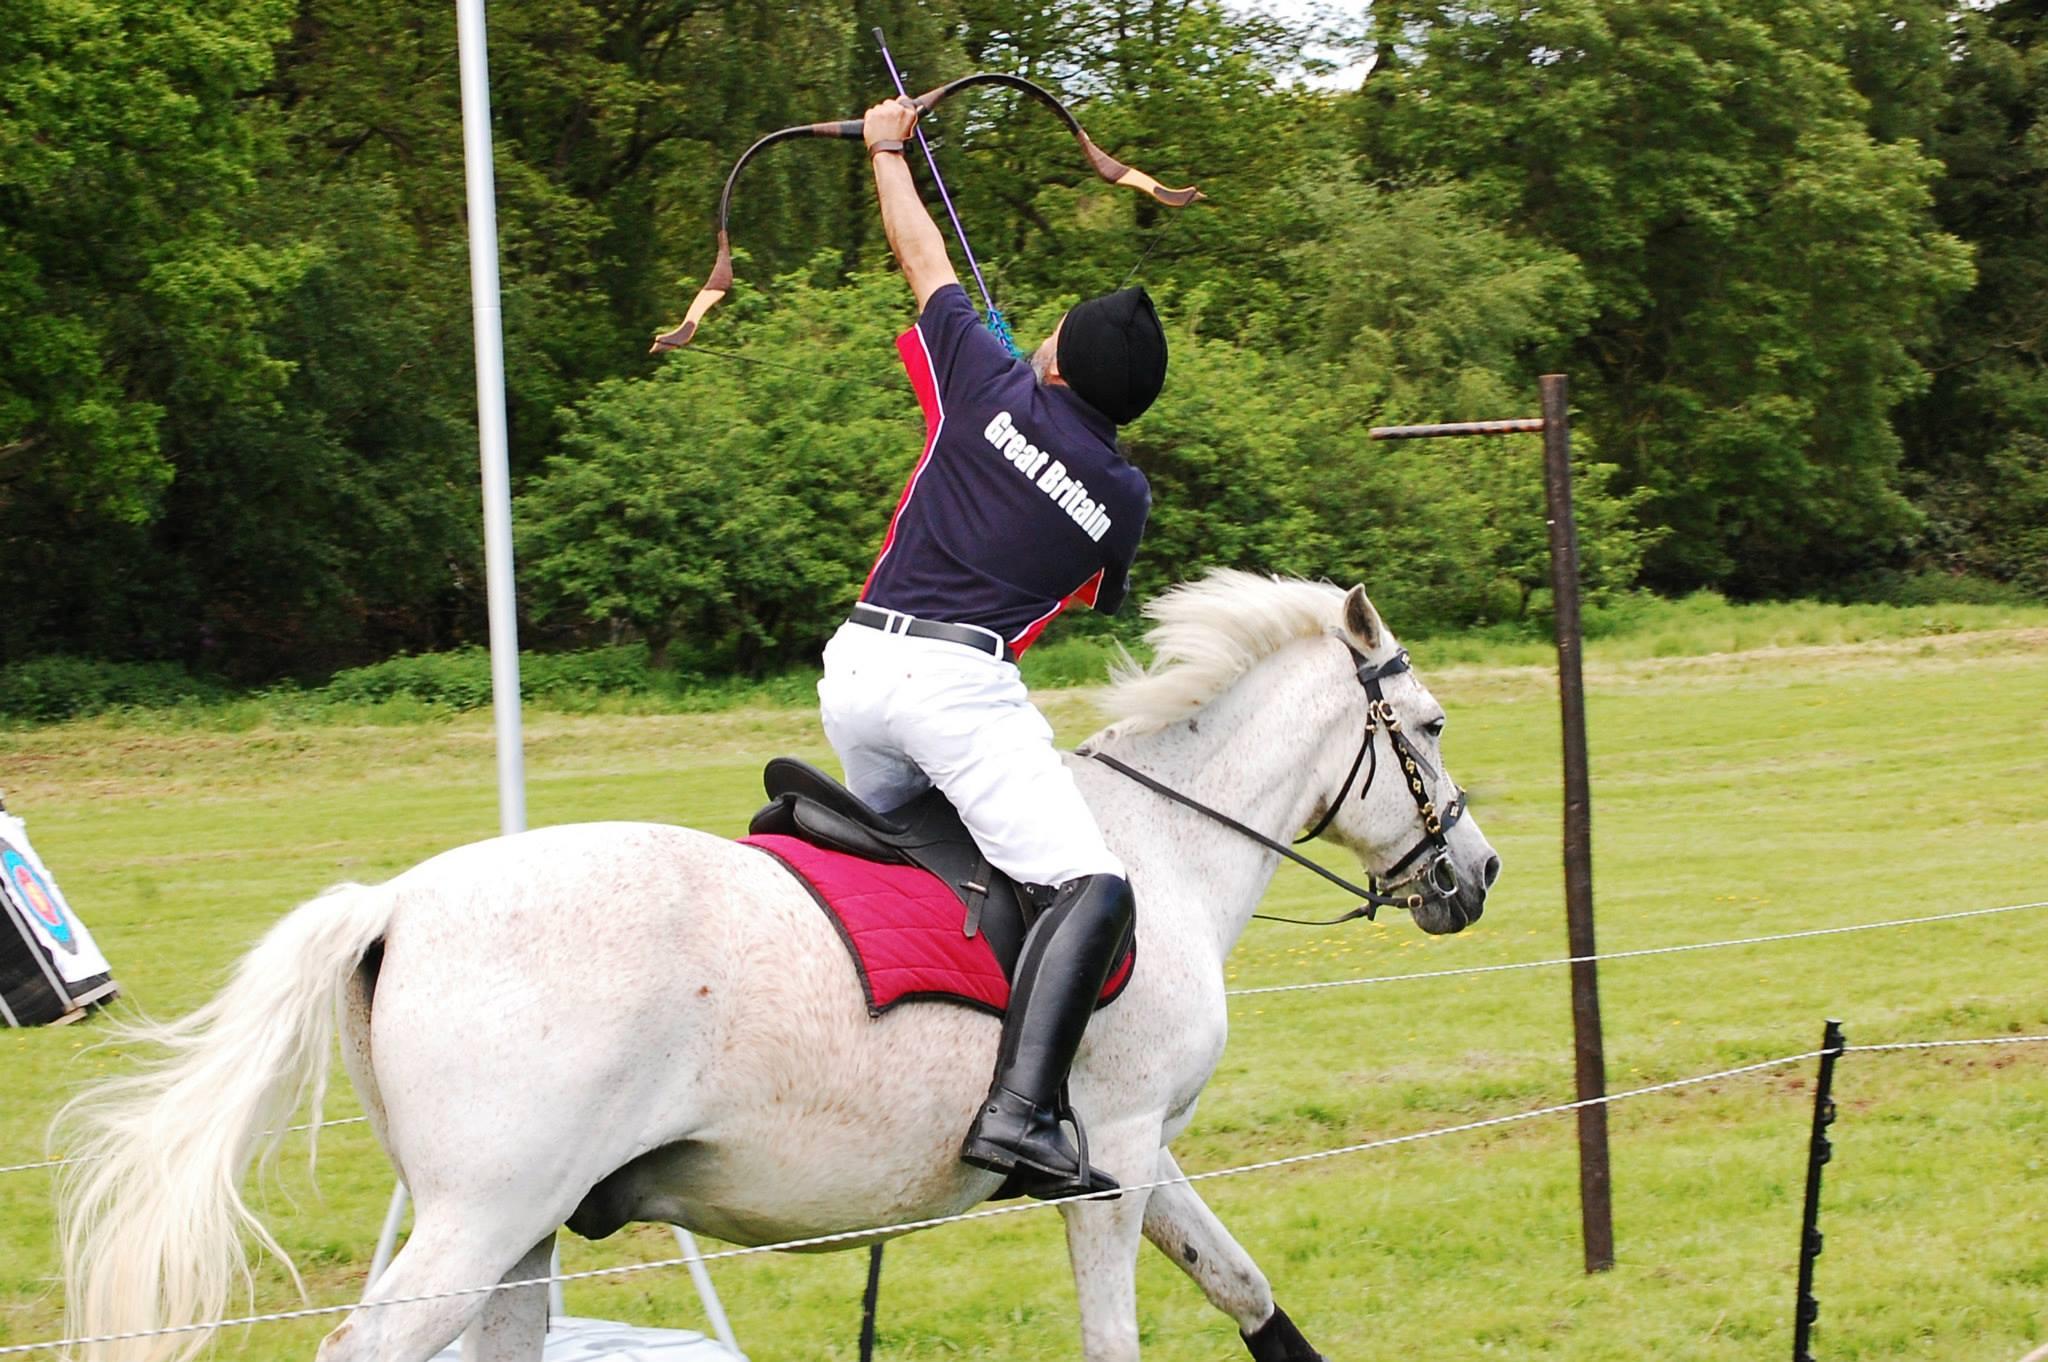 Gurbir Horse back.jpg